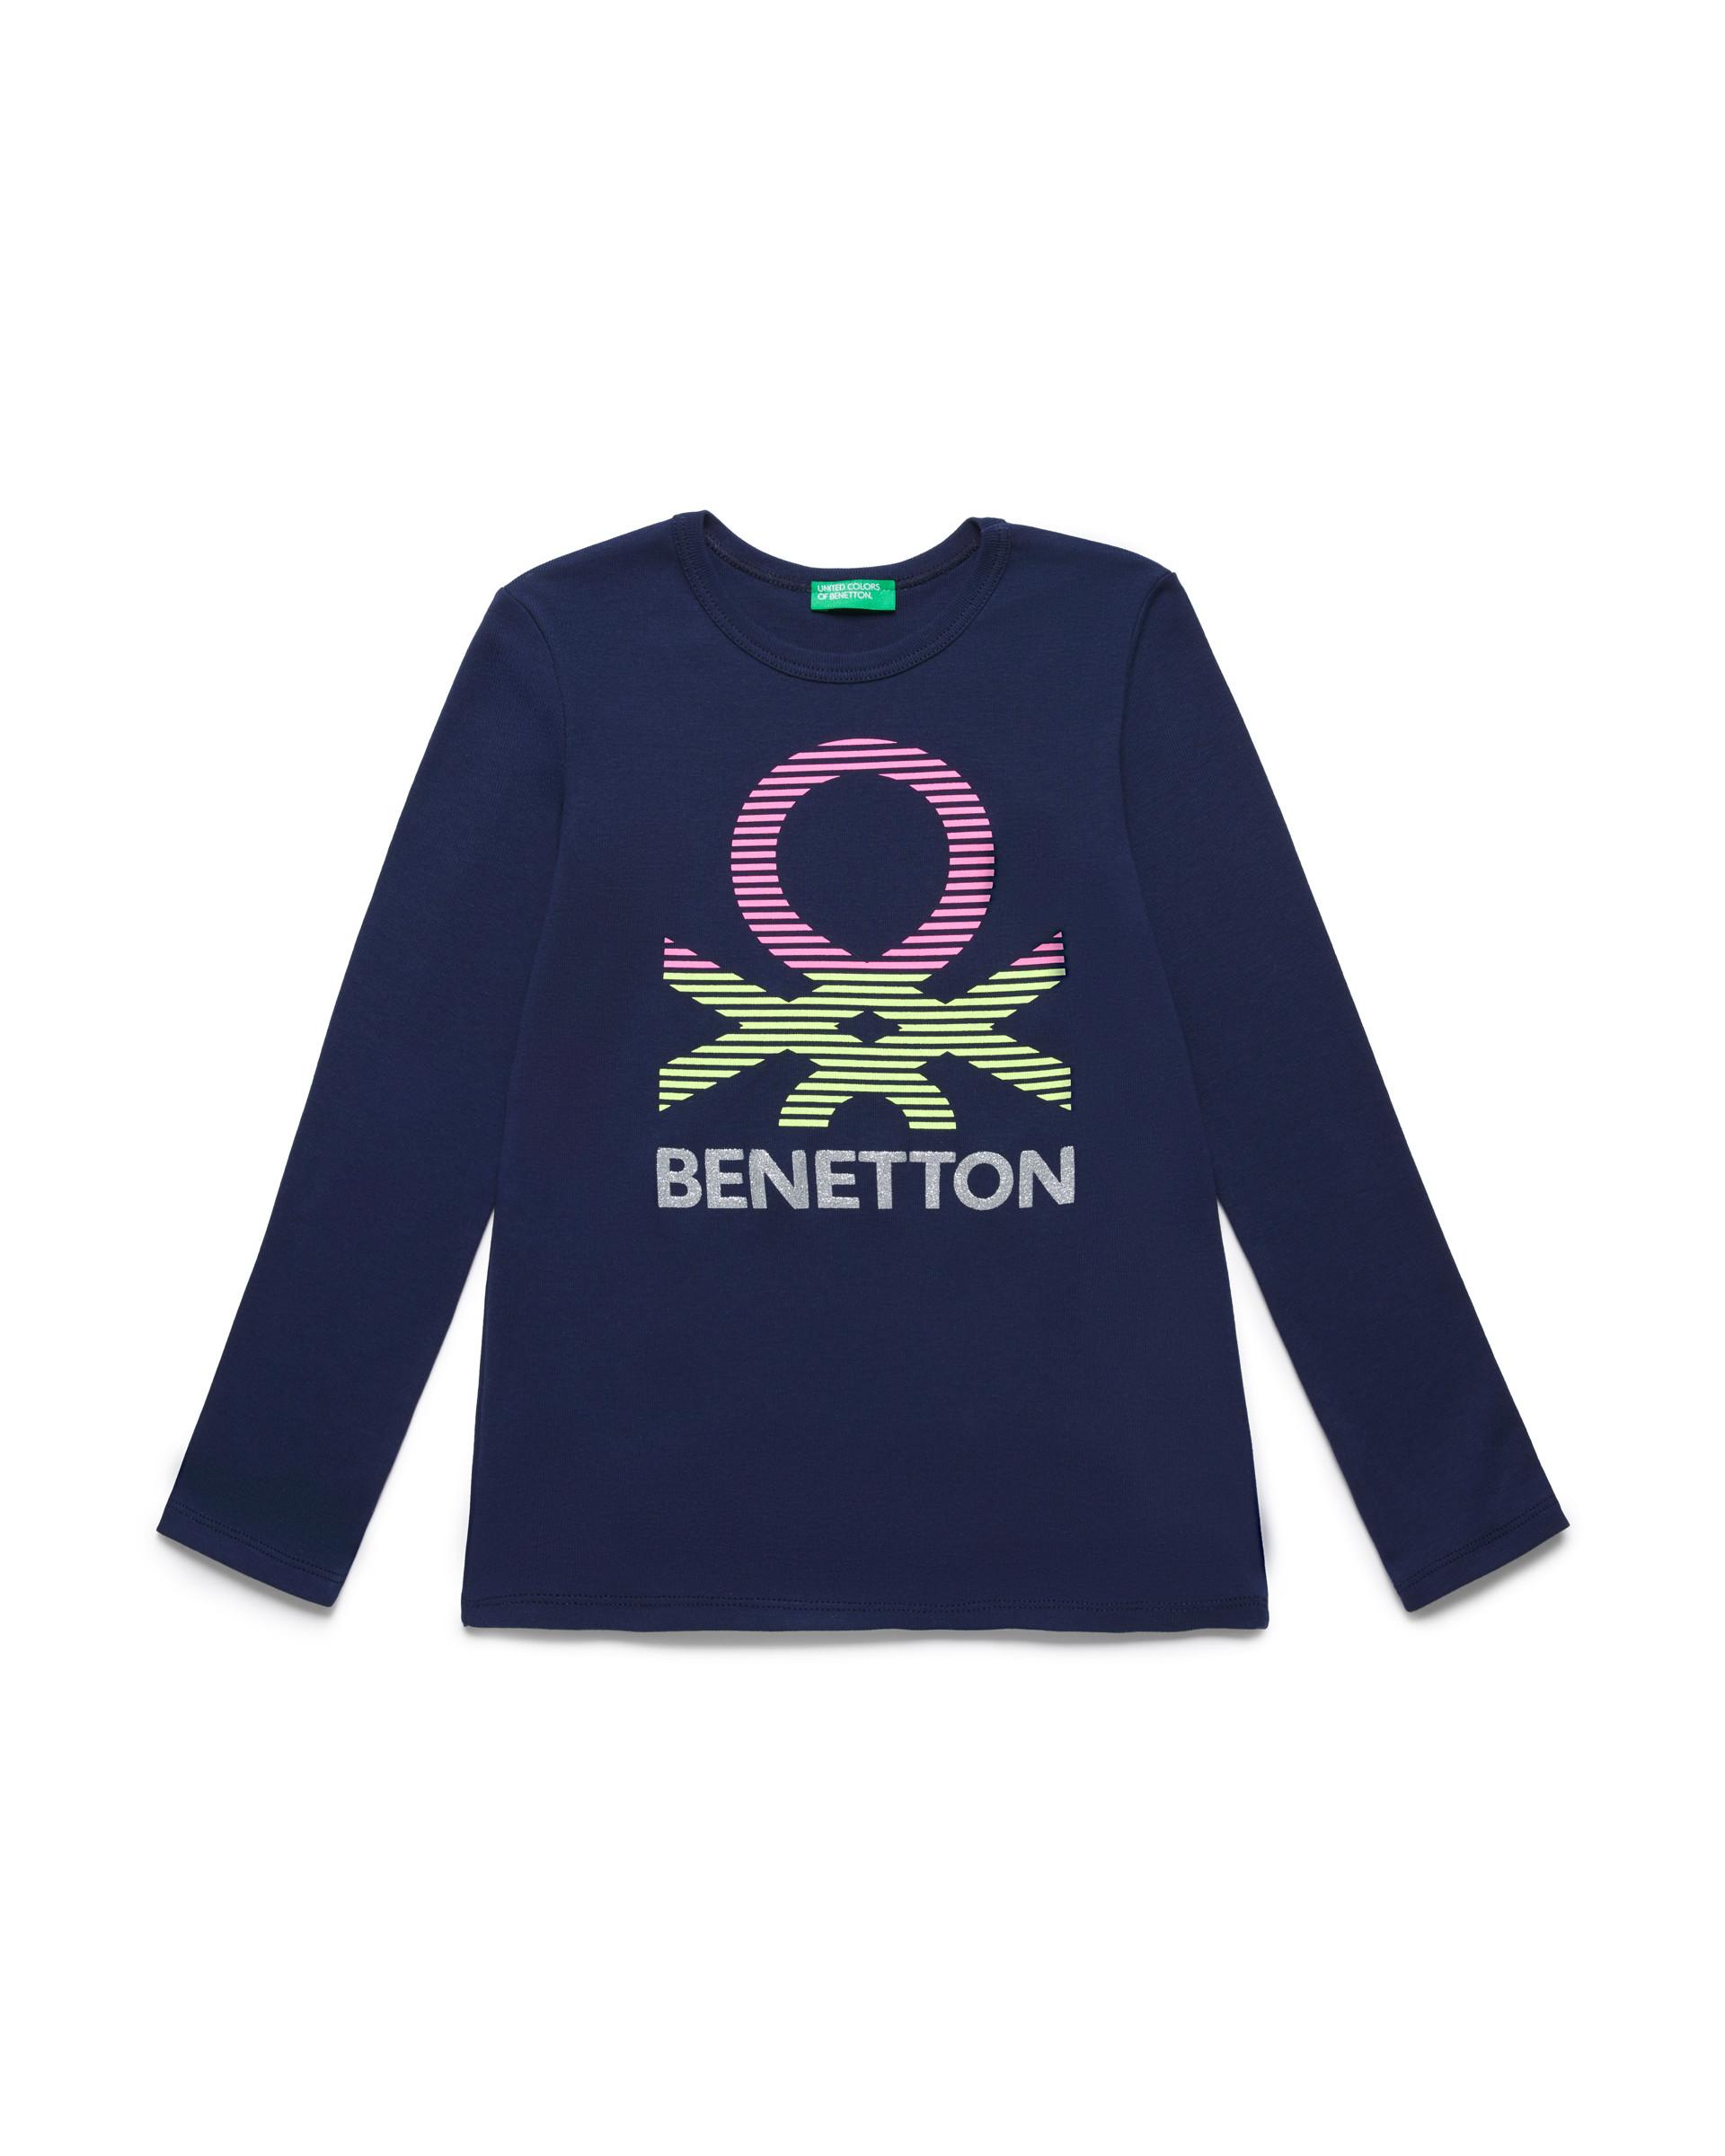 Купить 20P_3I9WC14J3_252, Футболка для девочек Benetton 3I9WC14J3_252 р-р 128, United Colors of Benetton, Футболки для девочек